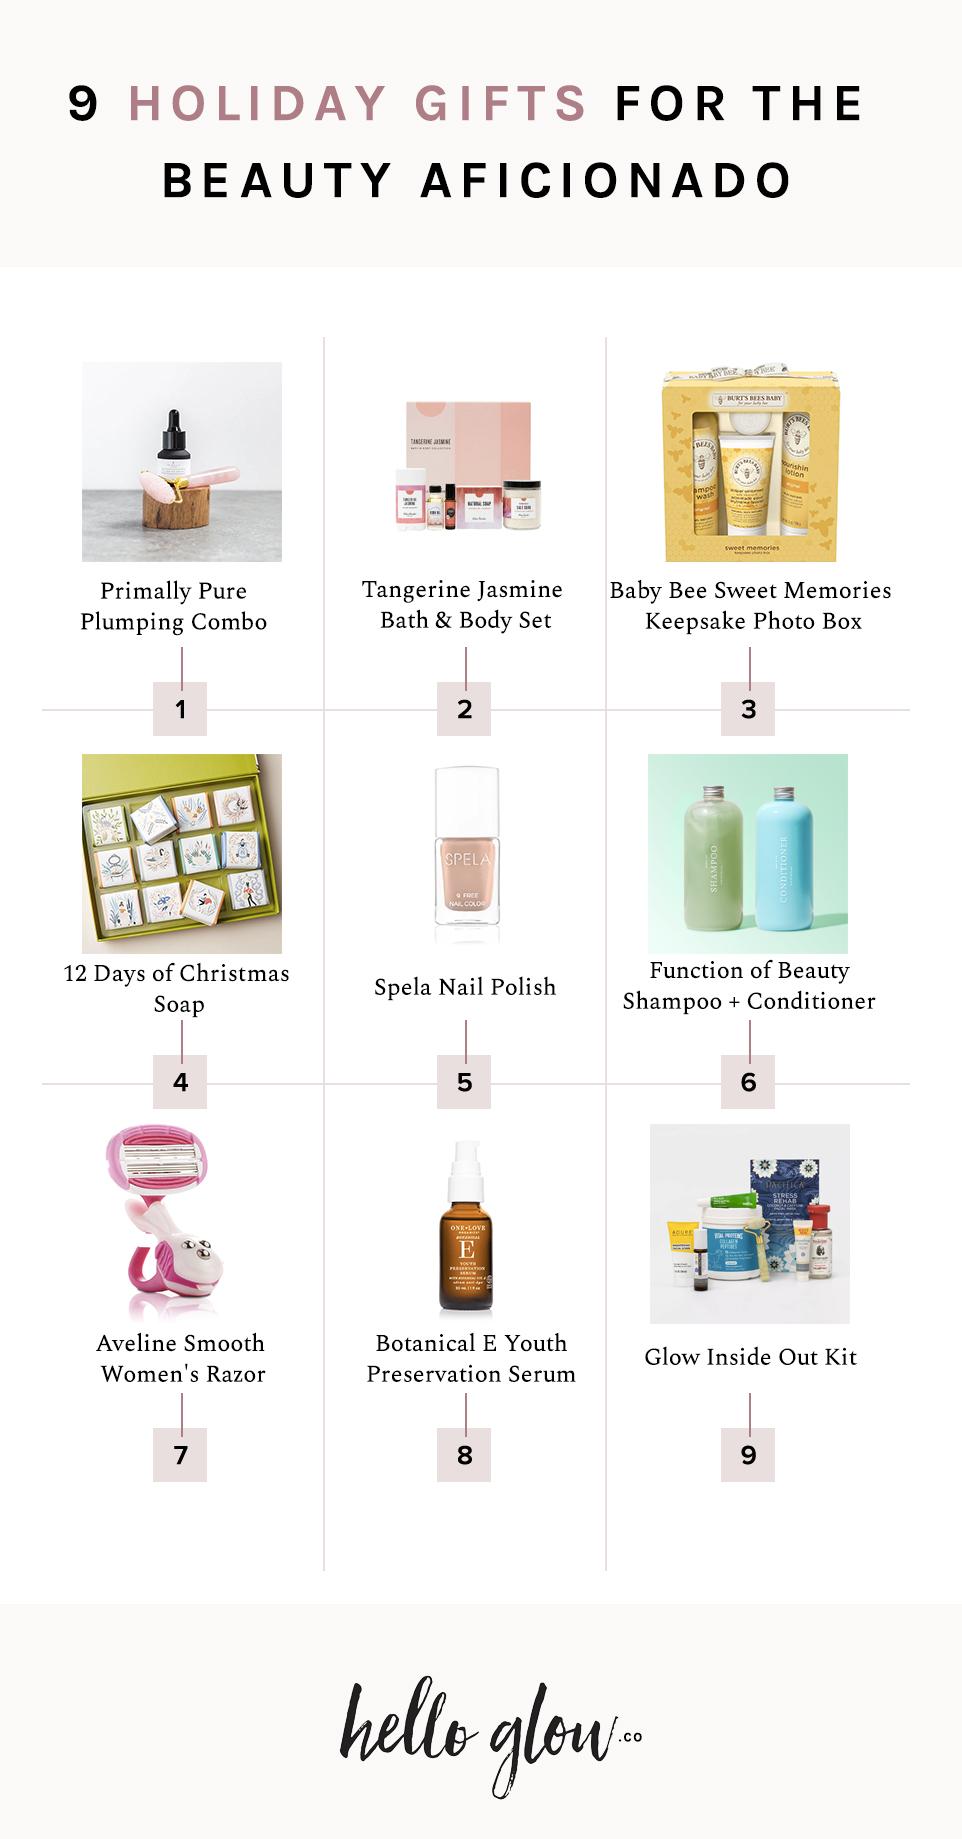 9 Holiday Gifts For The Beauty Aficionado